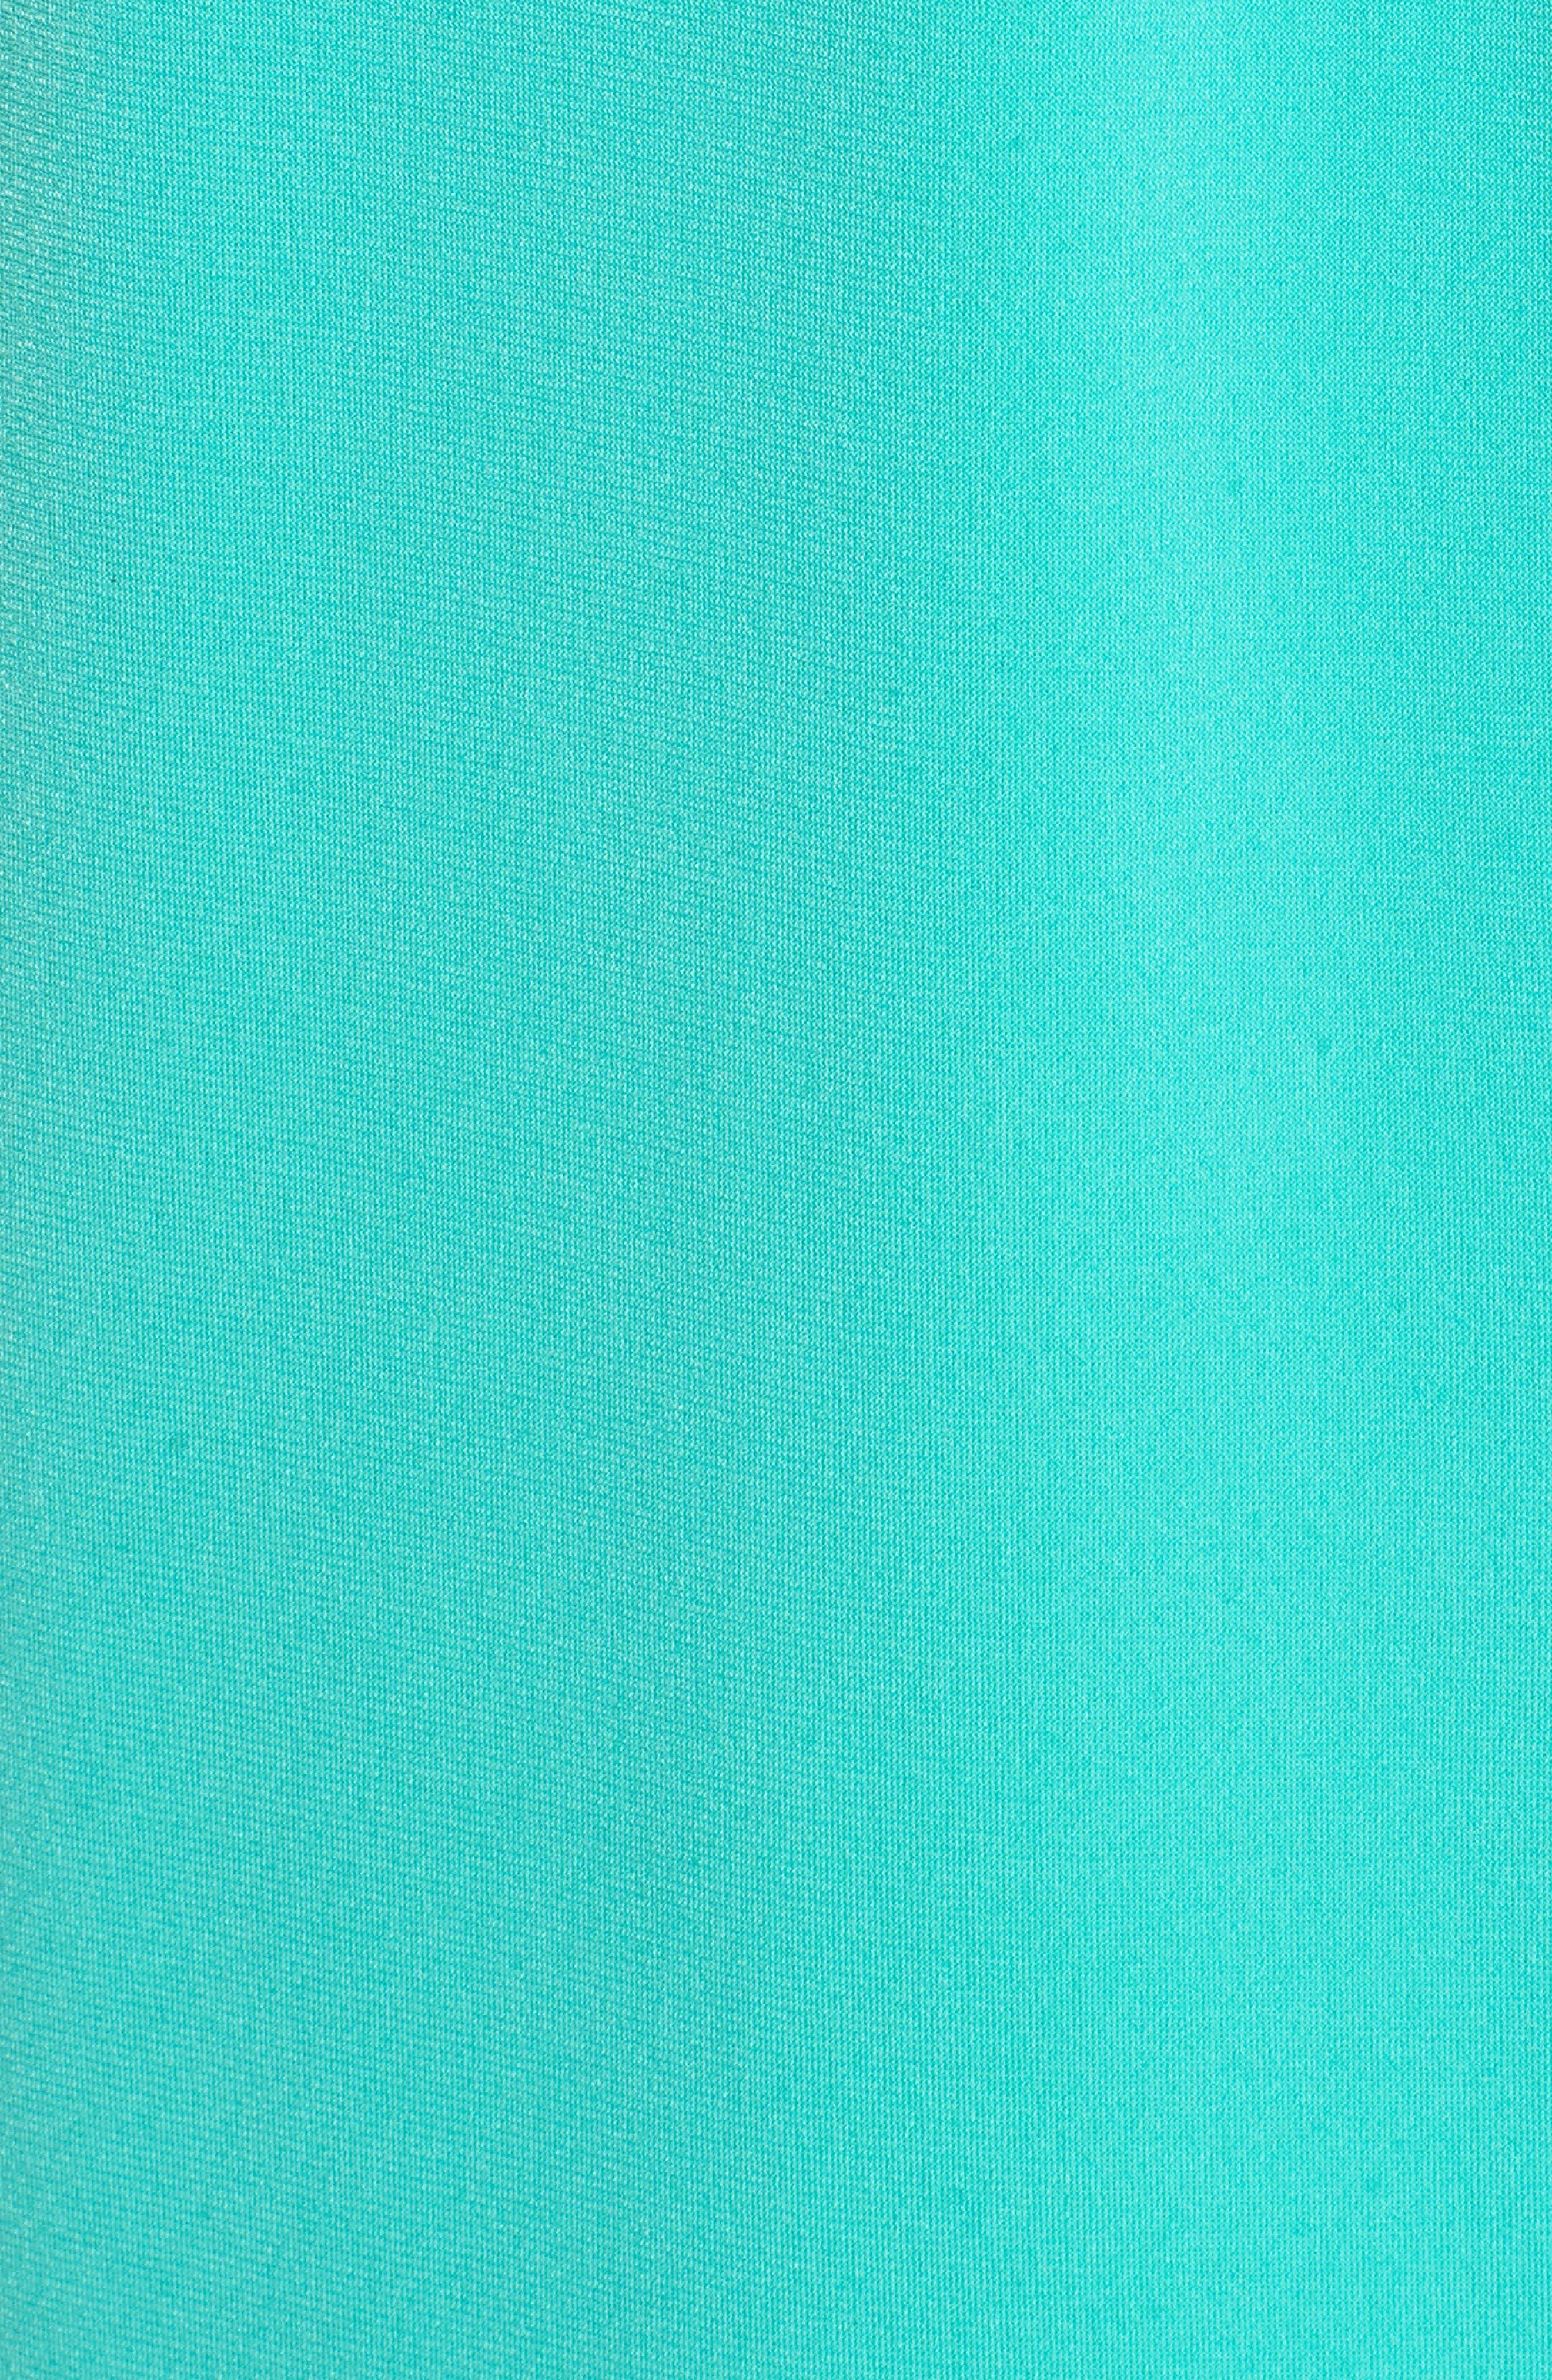 Chain Detail Halter Dress,                             Alternate thumbnail 6, color,                             Aqua